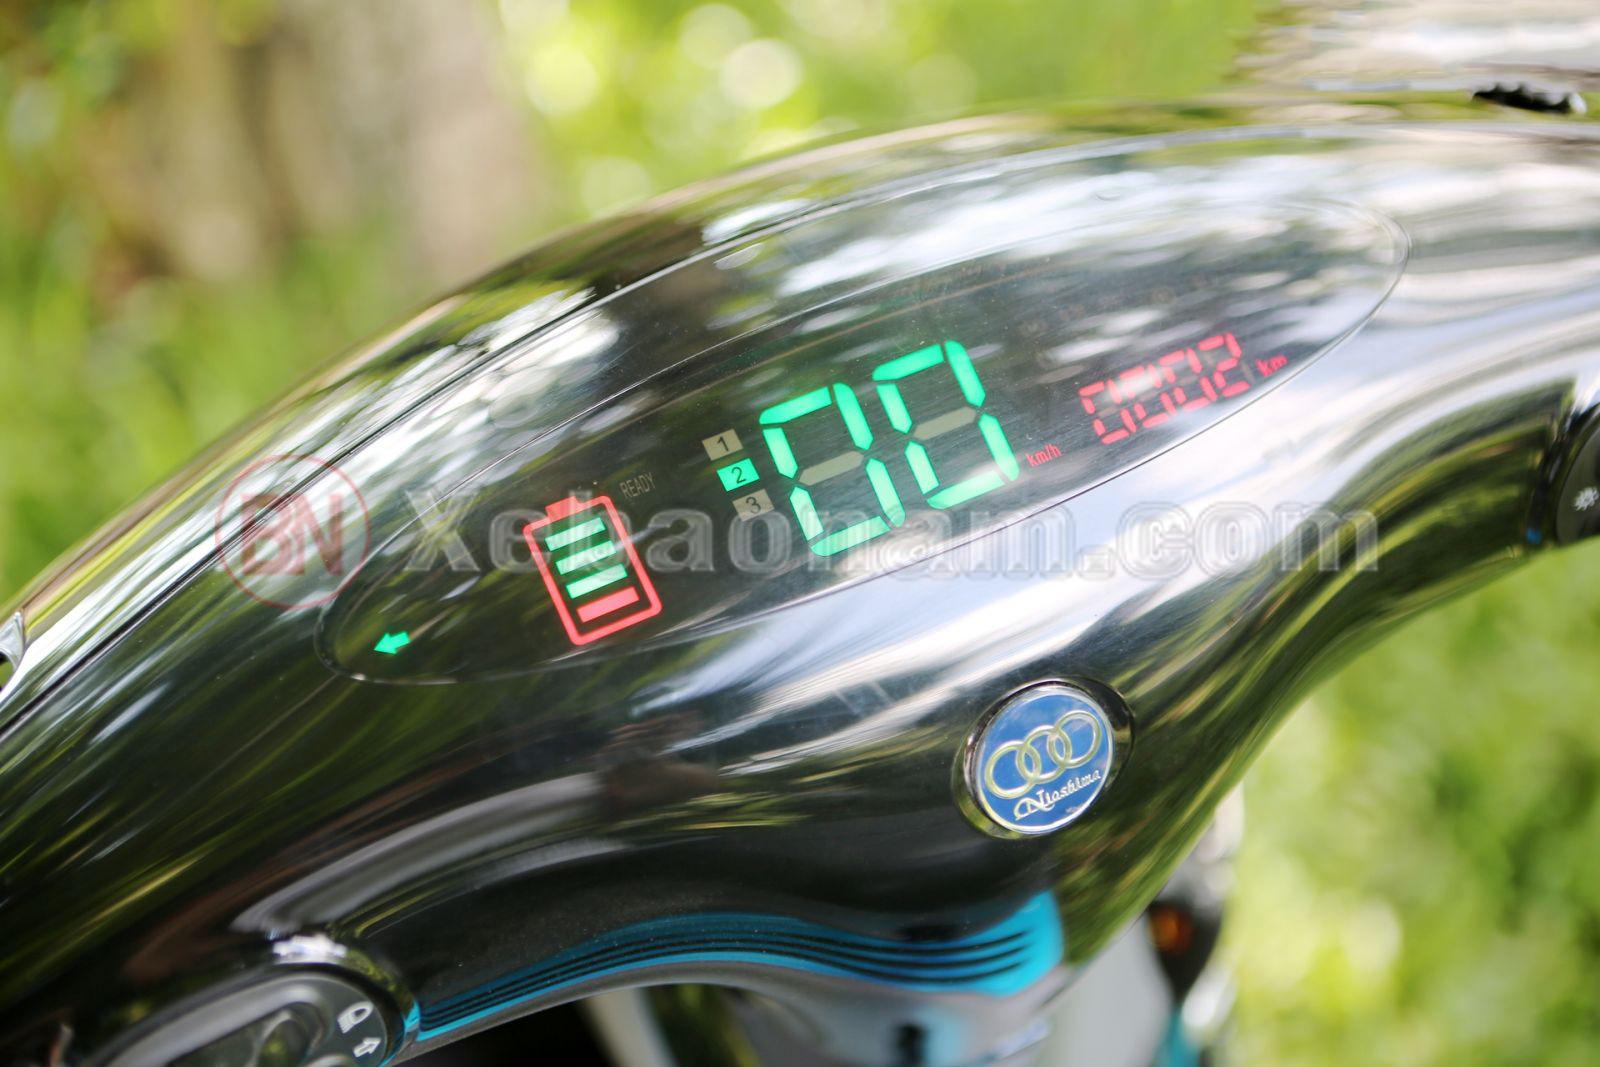 Đồng hồ hiện đại xe máy điện gogo niosima 2020